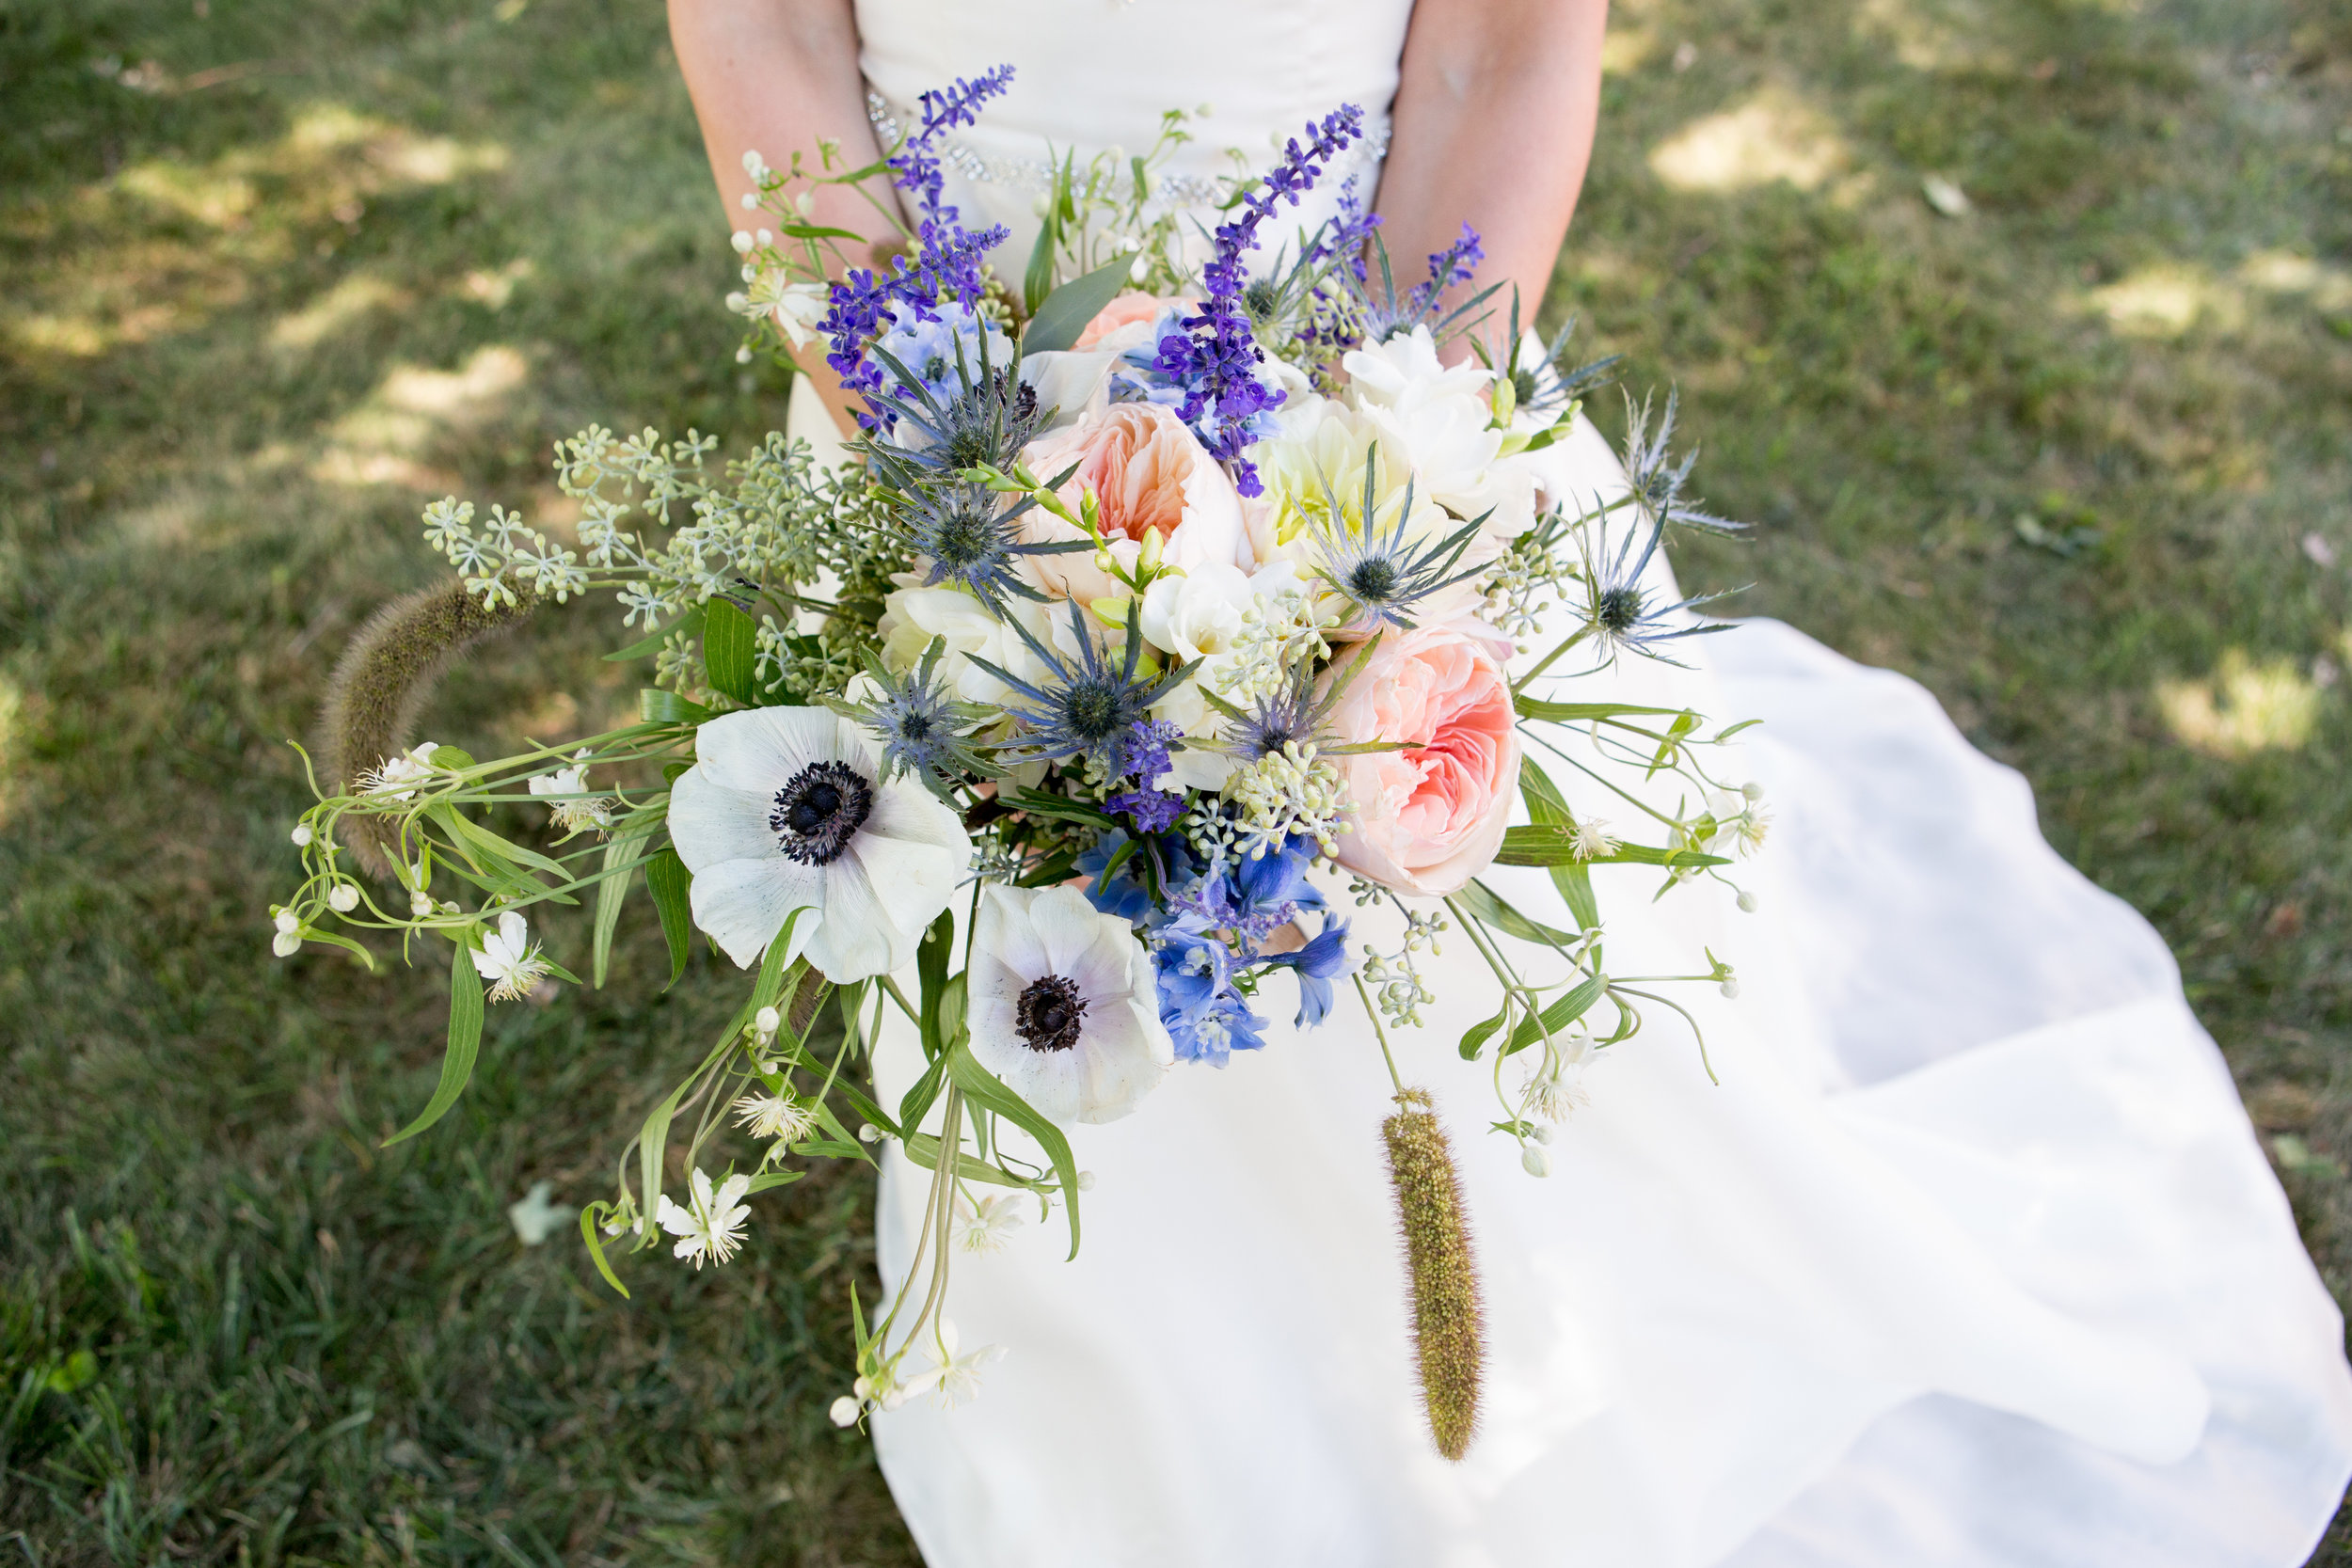 ca_080517_wedding_0161.jpg